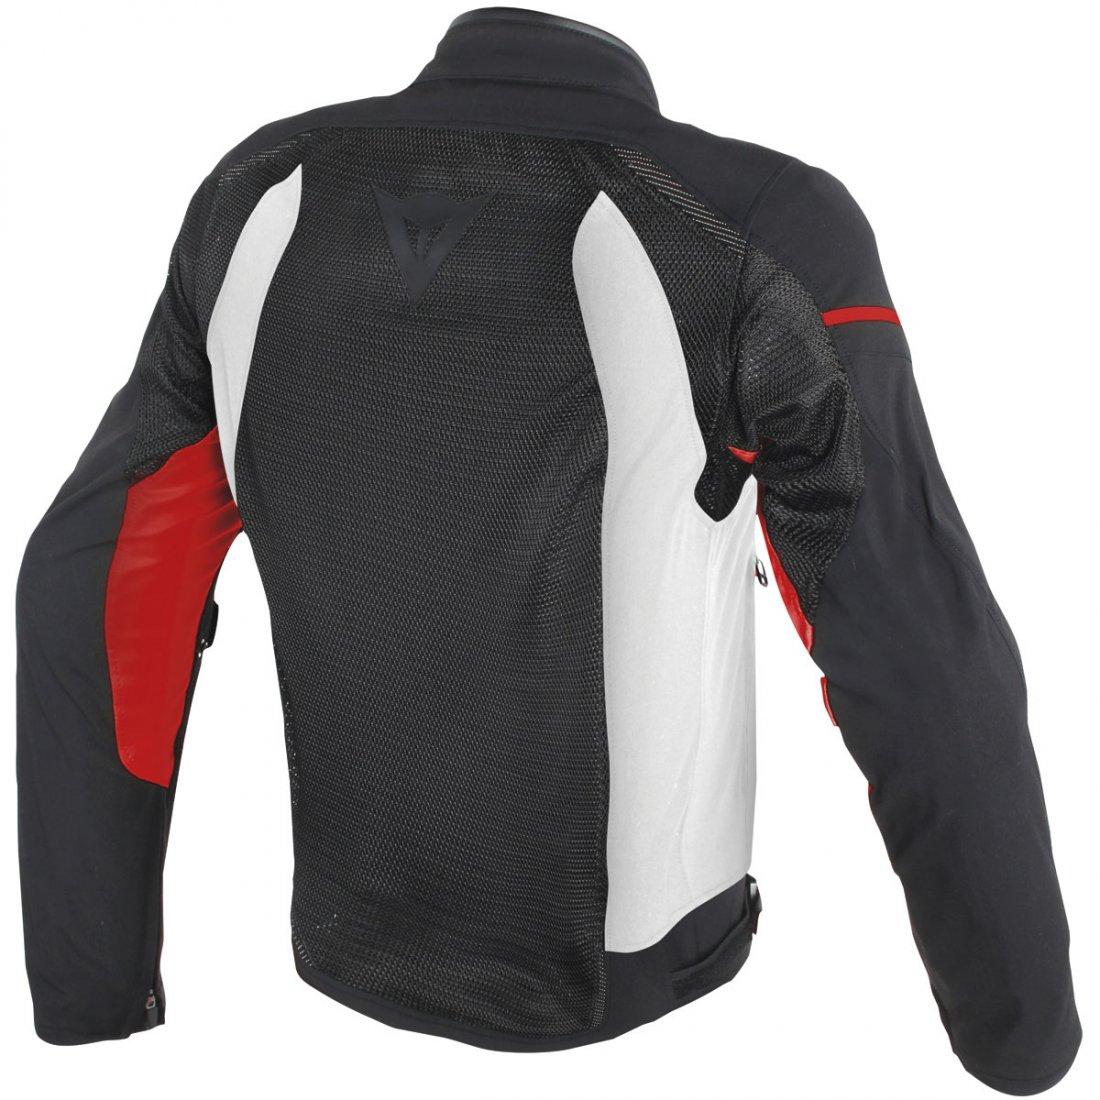 Dainese Air Frame D1 Tex Black White Red Jacket 183 Motocard